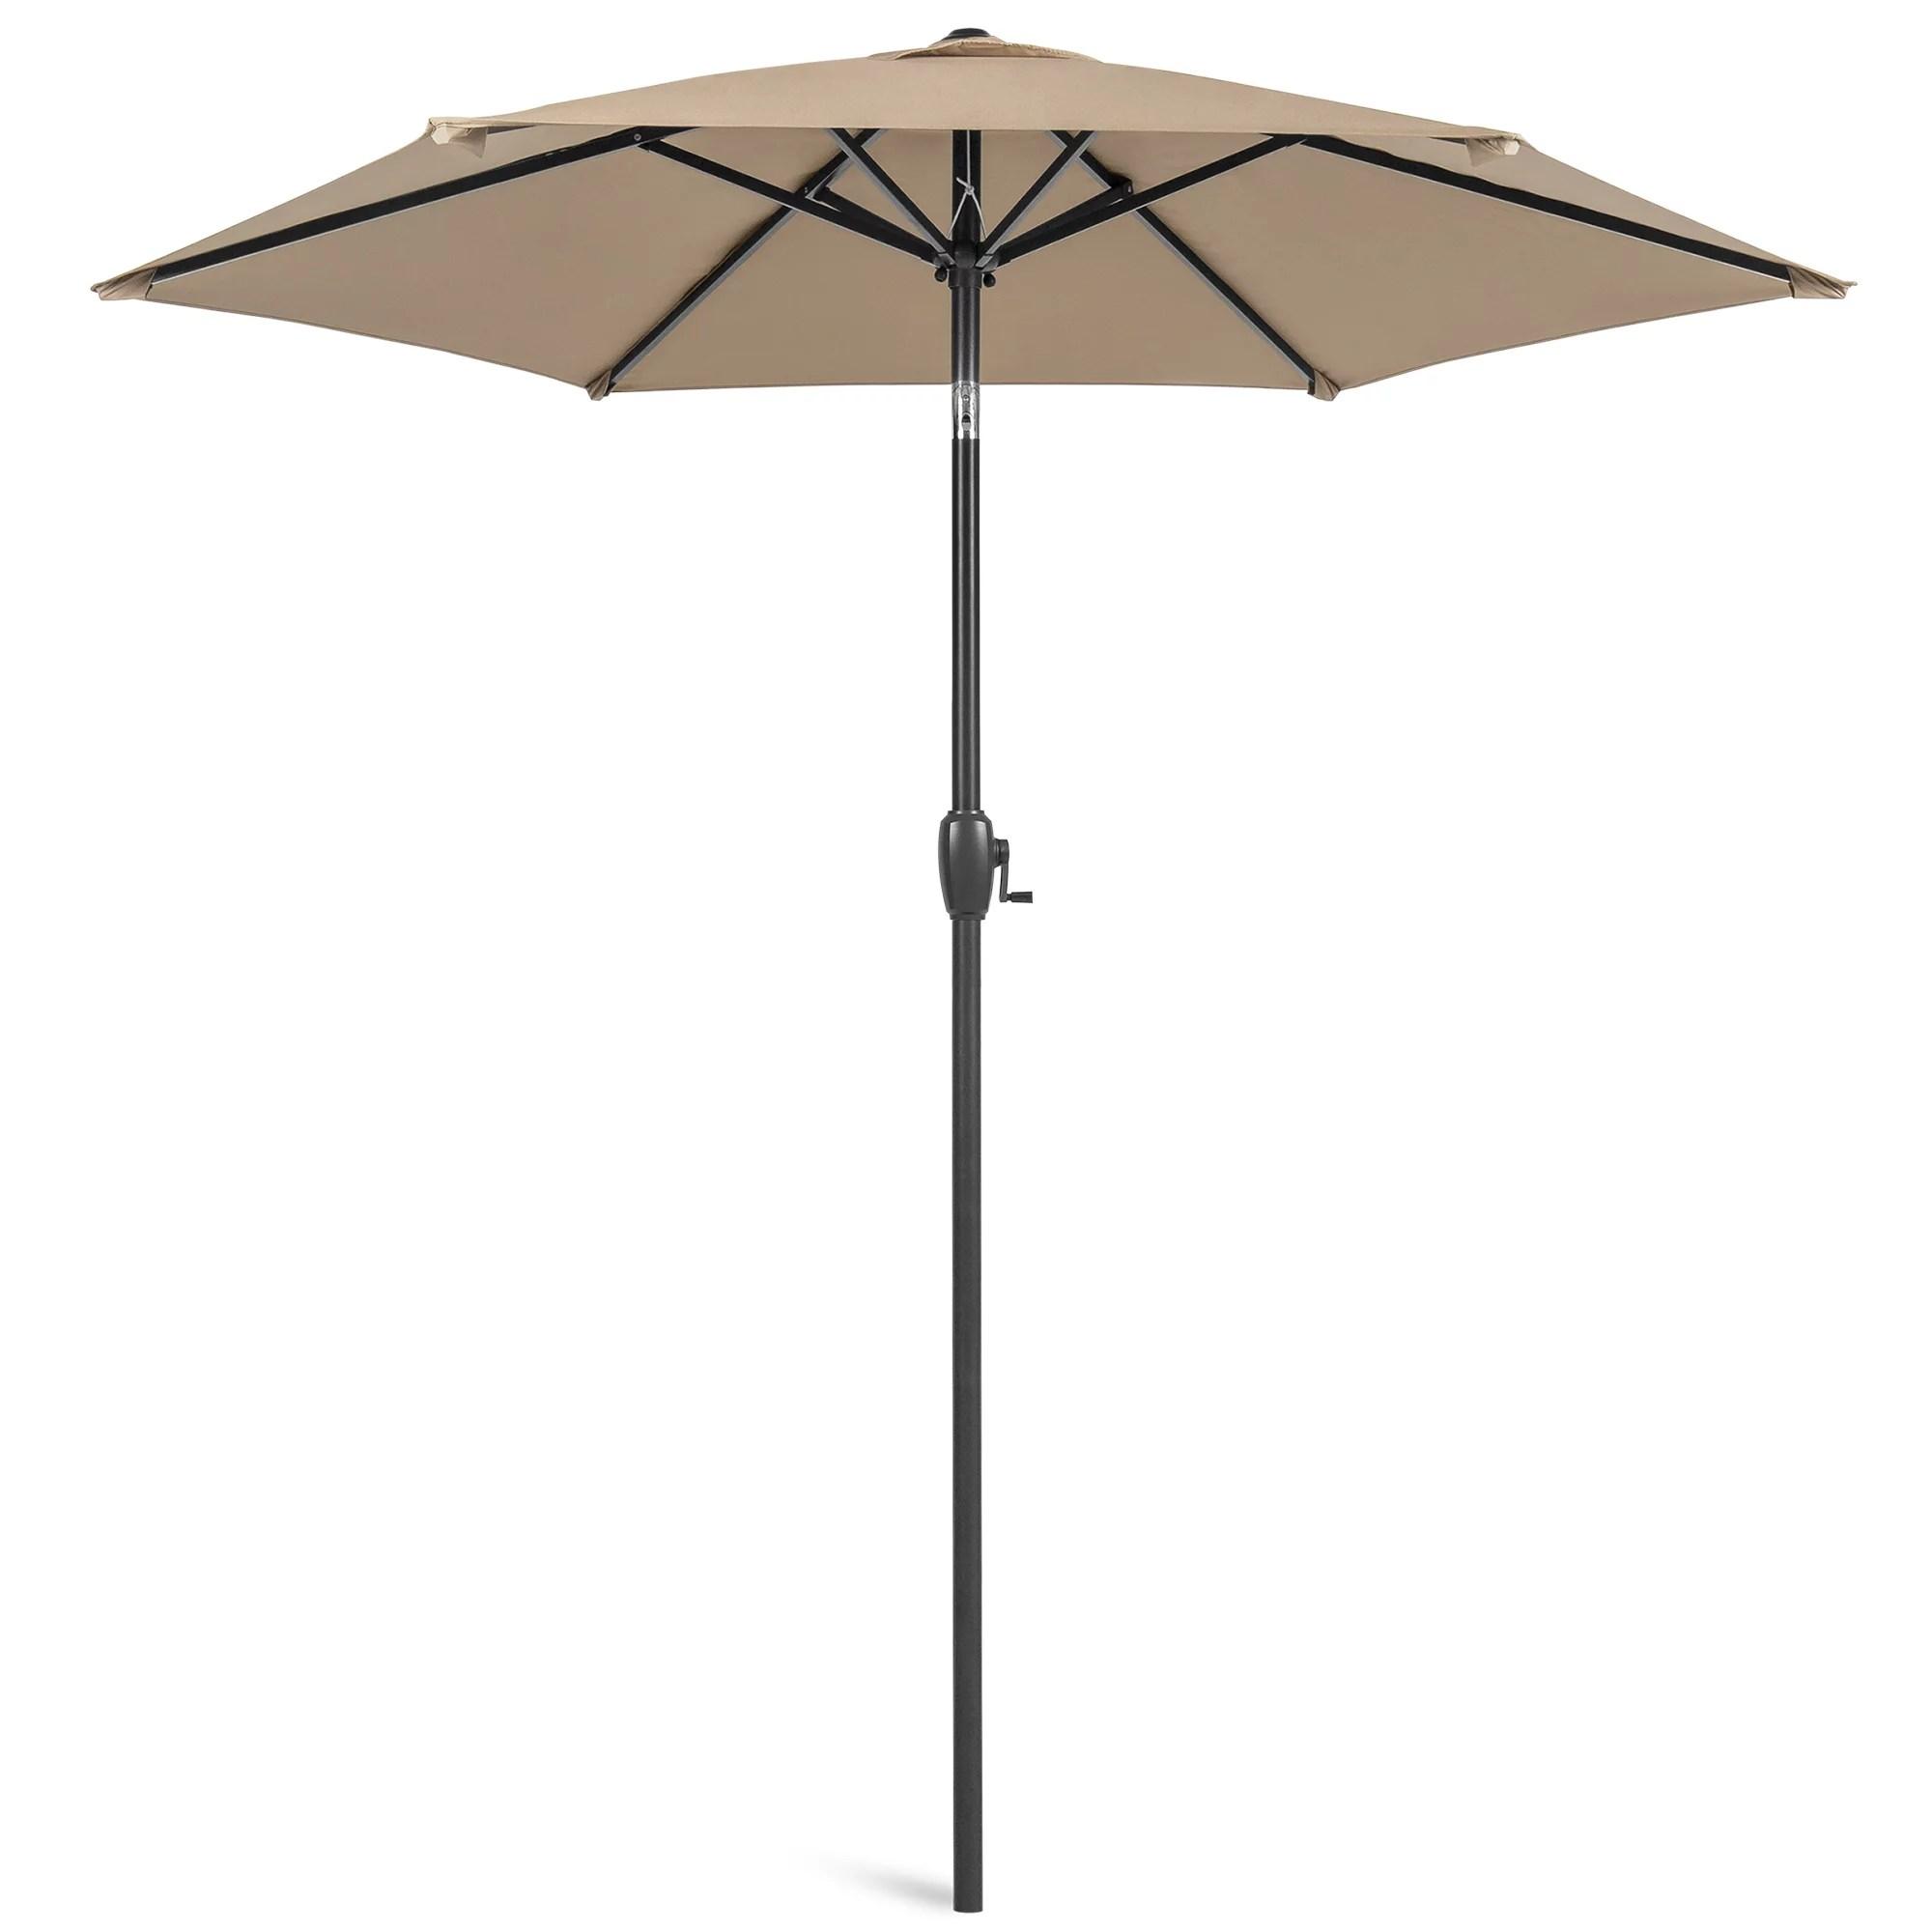 best choice products 7 5ft heavy duty outdoor market patio umbrella w push button tilt easy crank lift tan